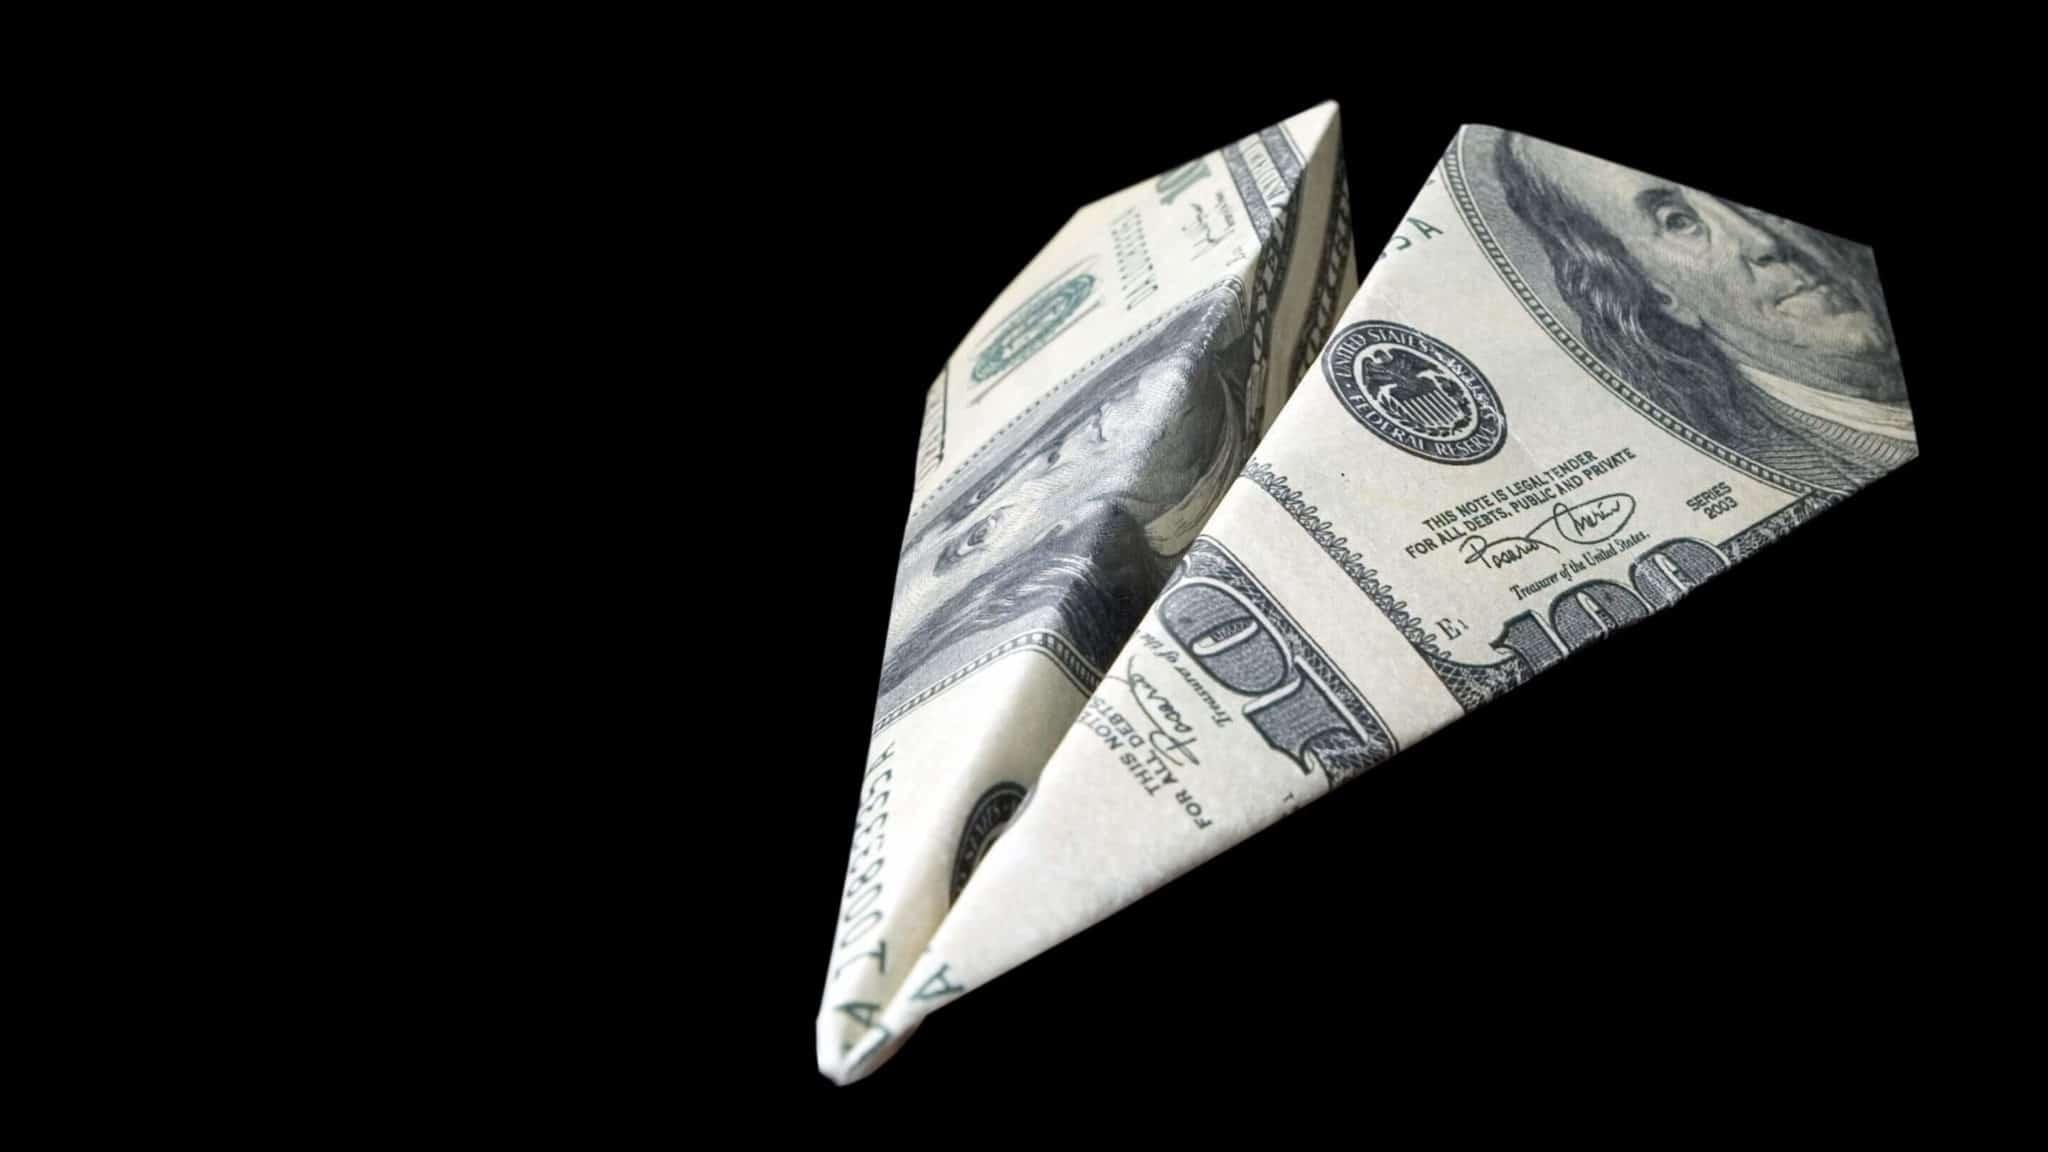 Samolot z banknotu